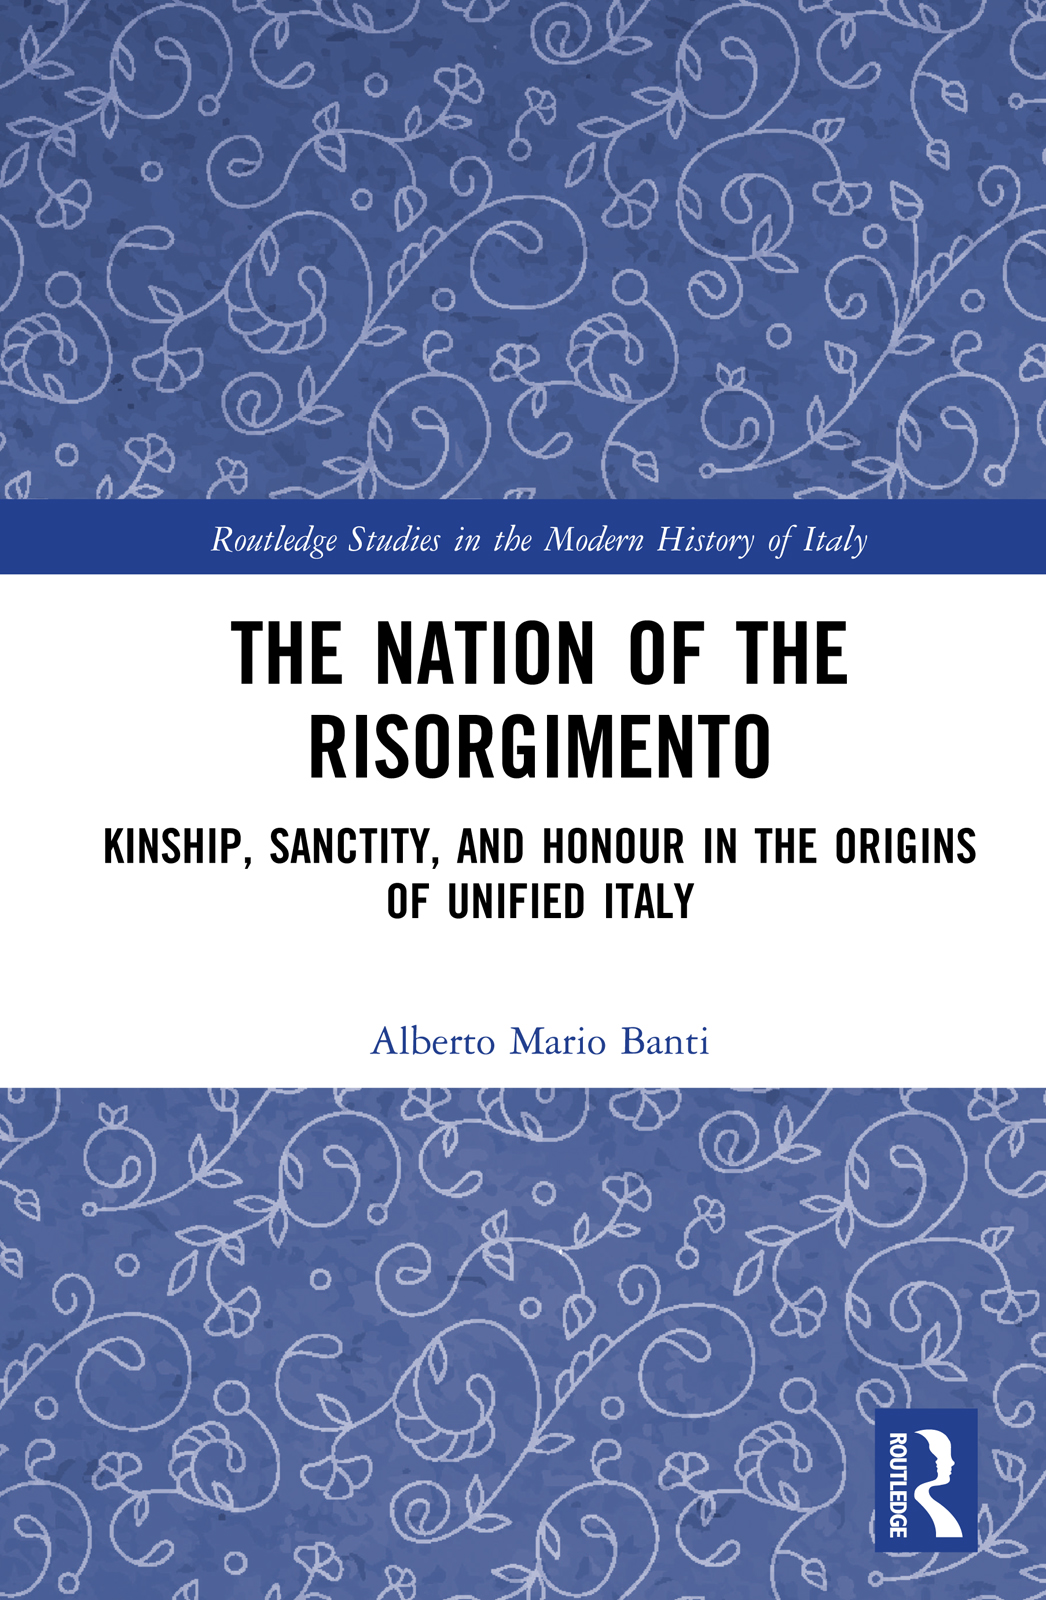 The Nation of the Risorgimento